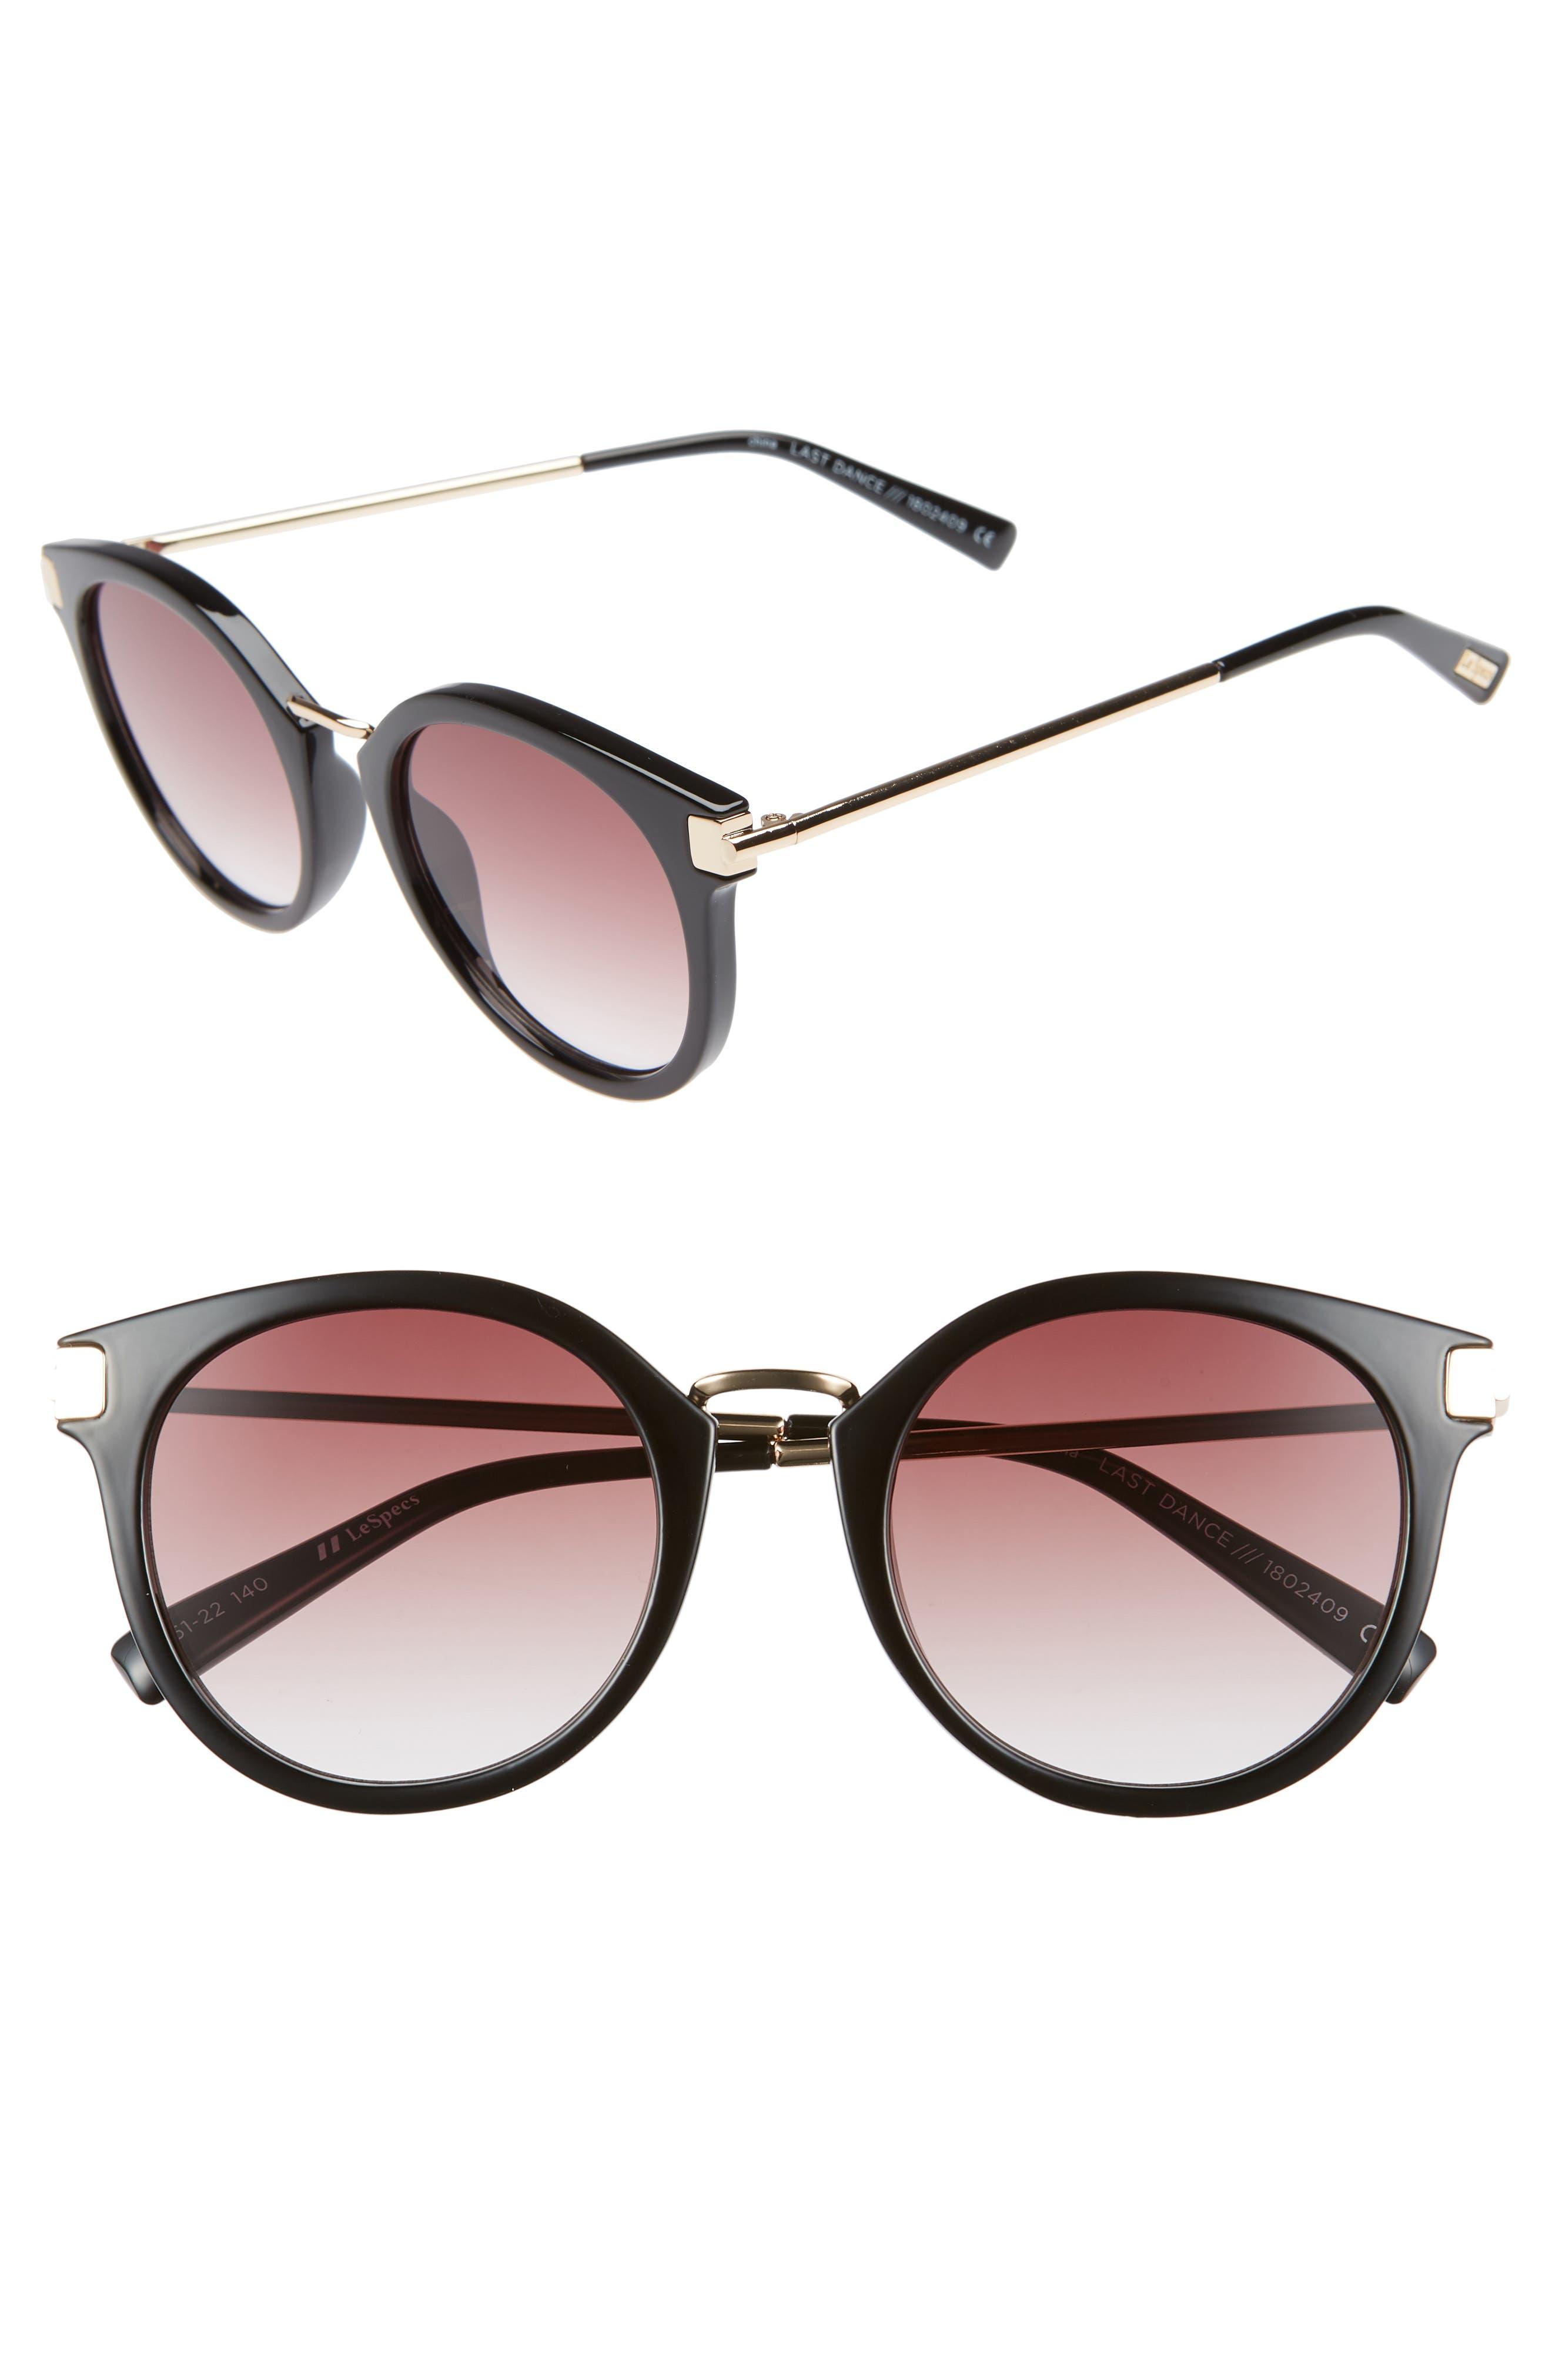 Le Specs Last Dance 51Mm Mirrored Round Sunglasses - Black